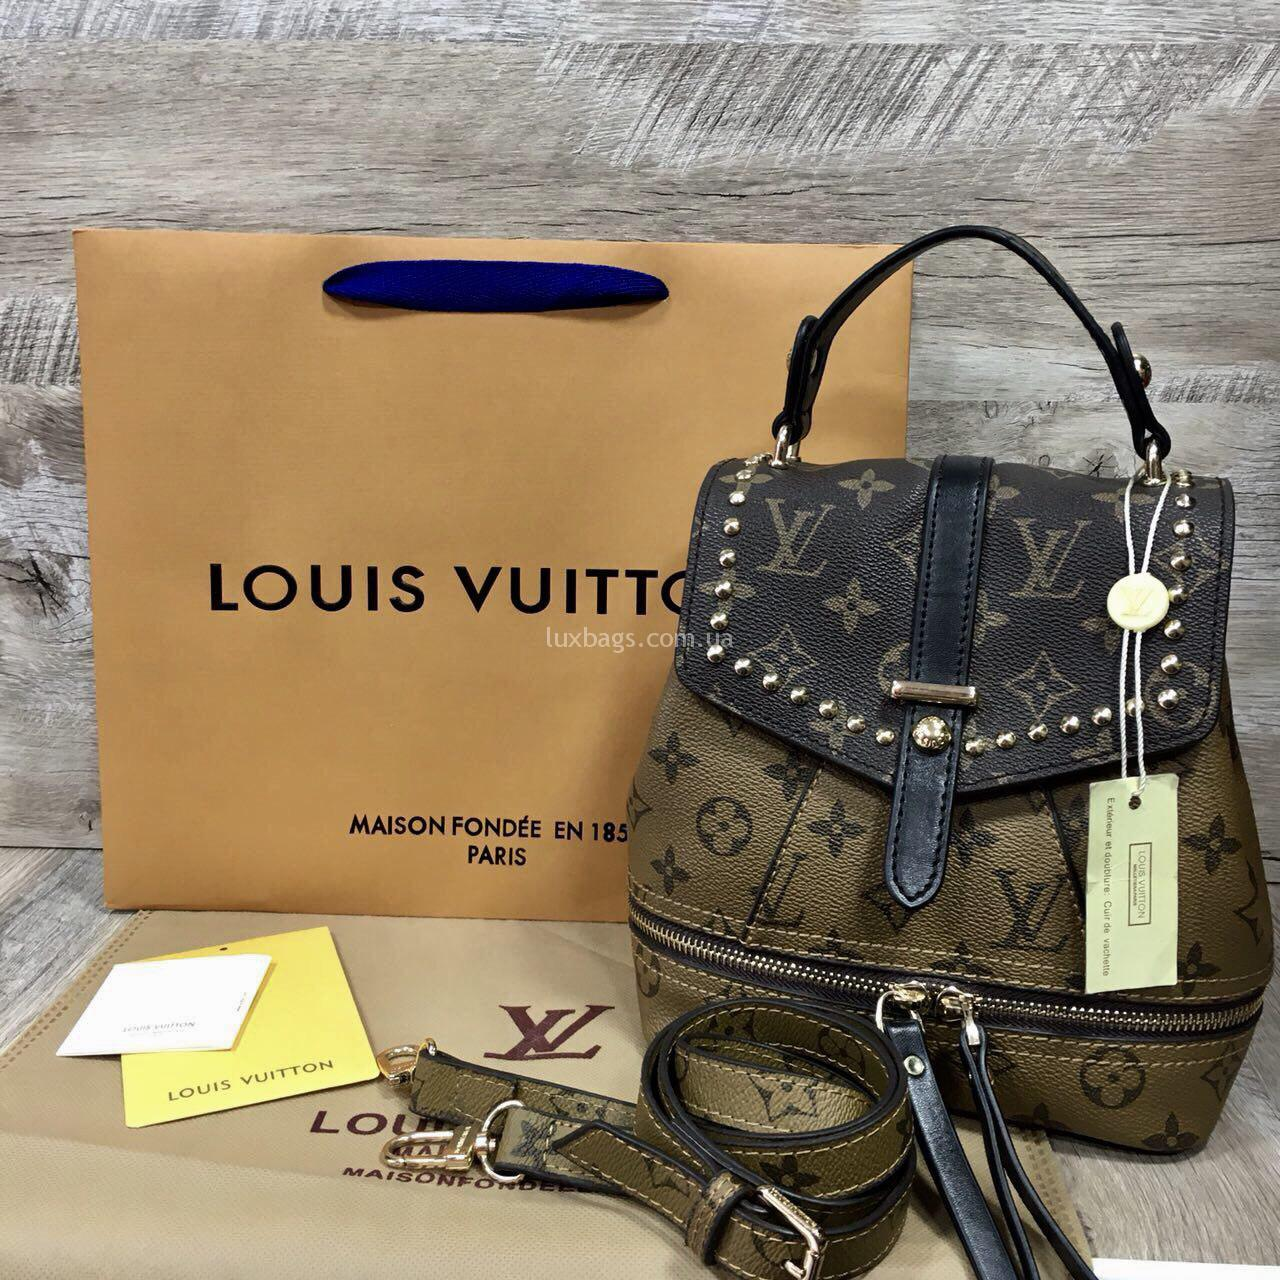 df0880e647f6 Купить Женский рюкзак сумка Louis Vuitton (Луи Витон)   Рюкзаки